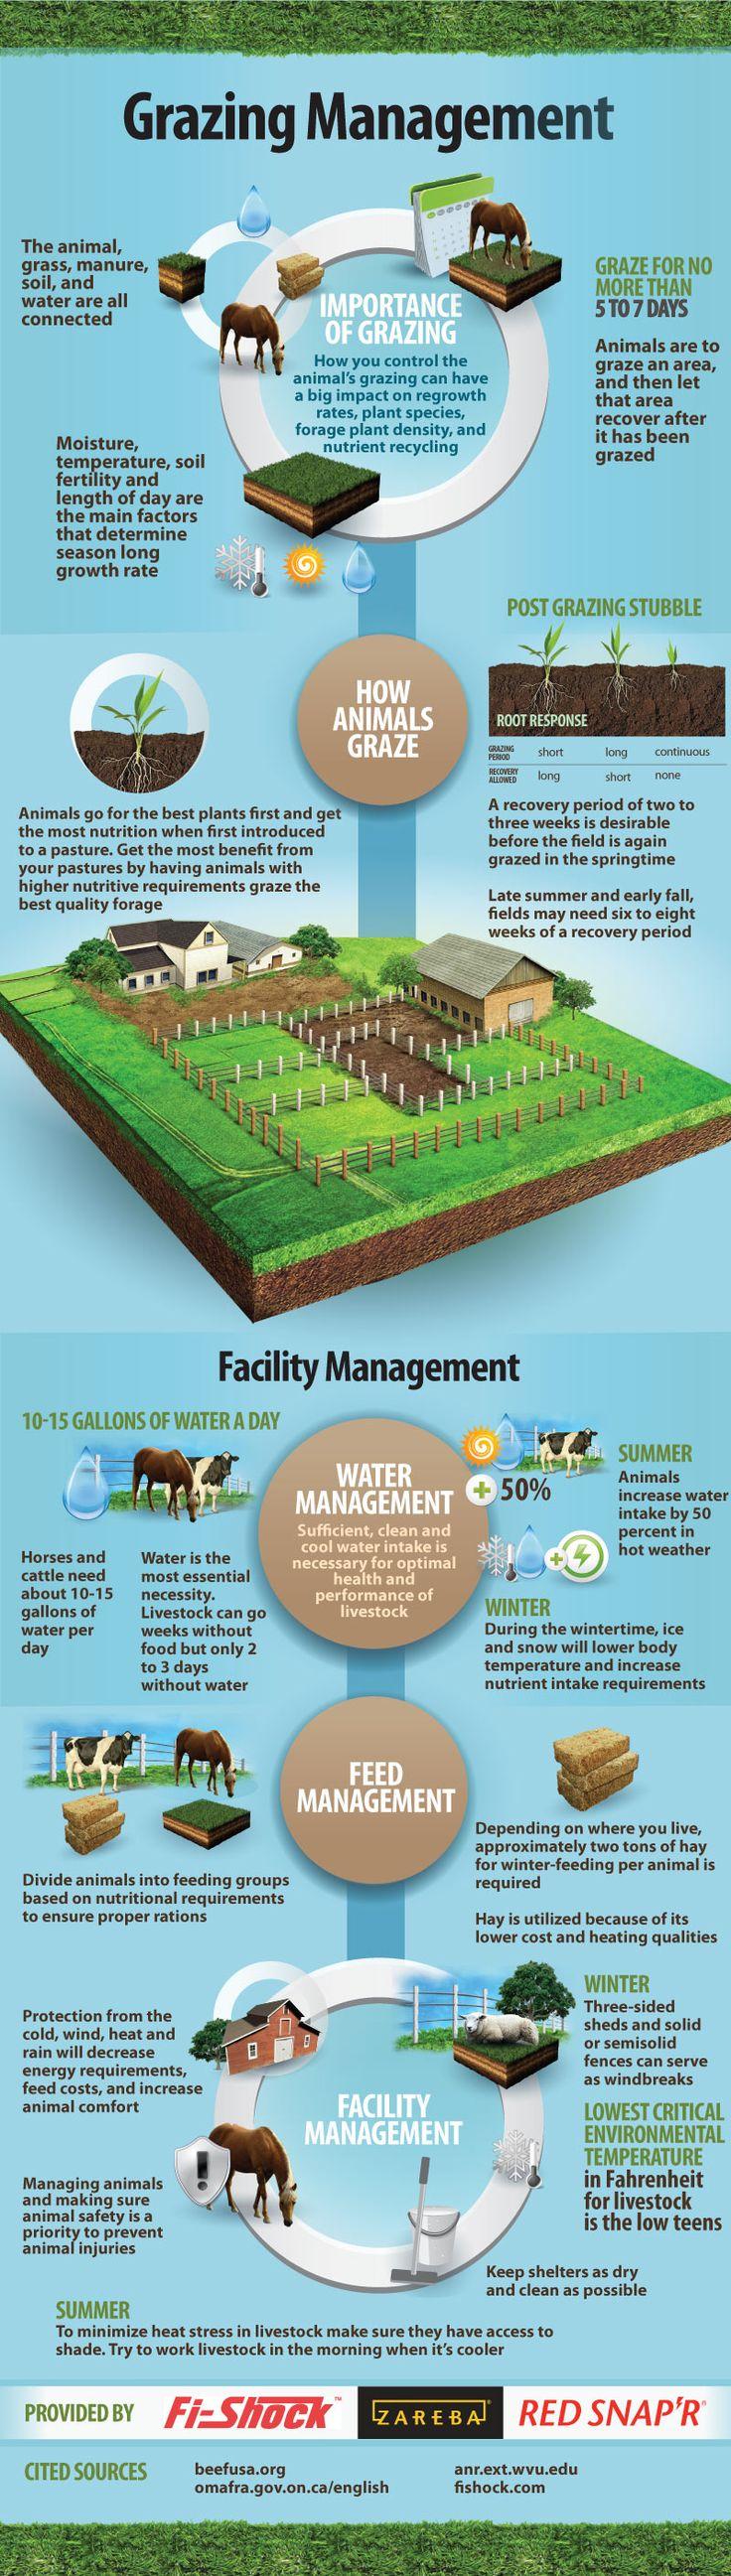 Grazing Management Infographic